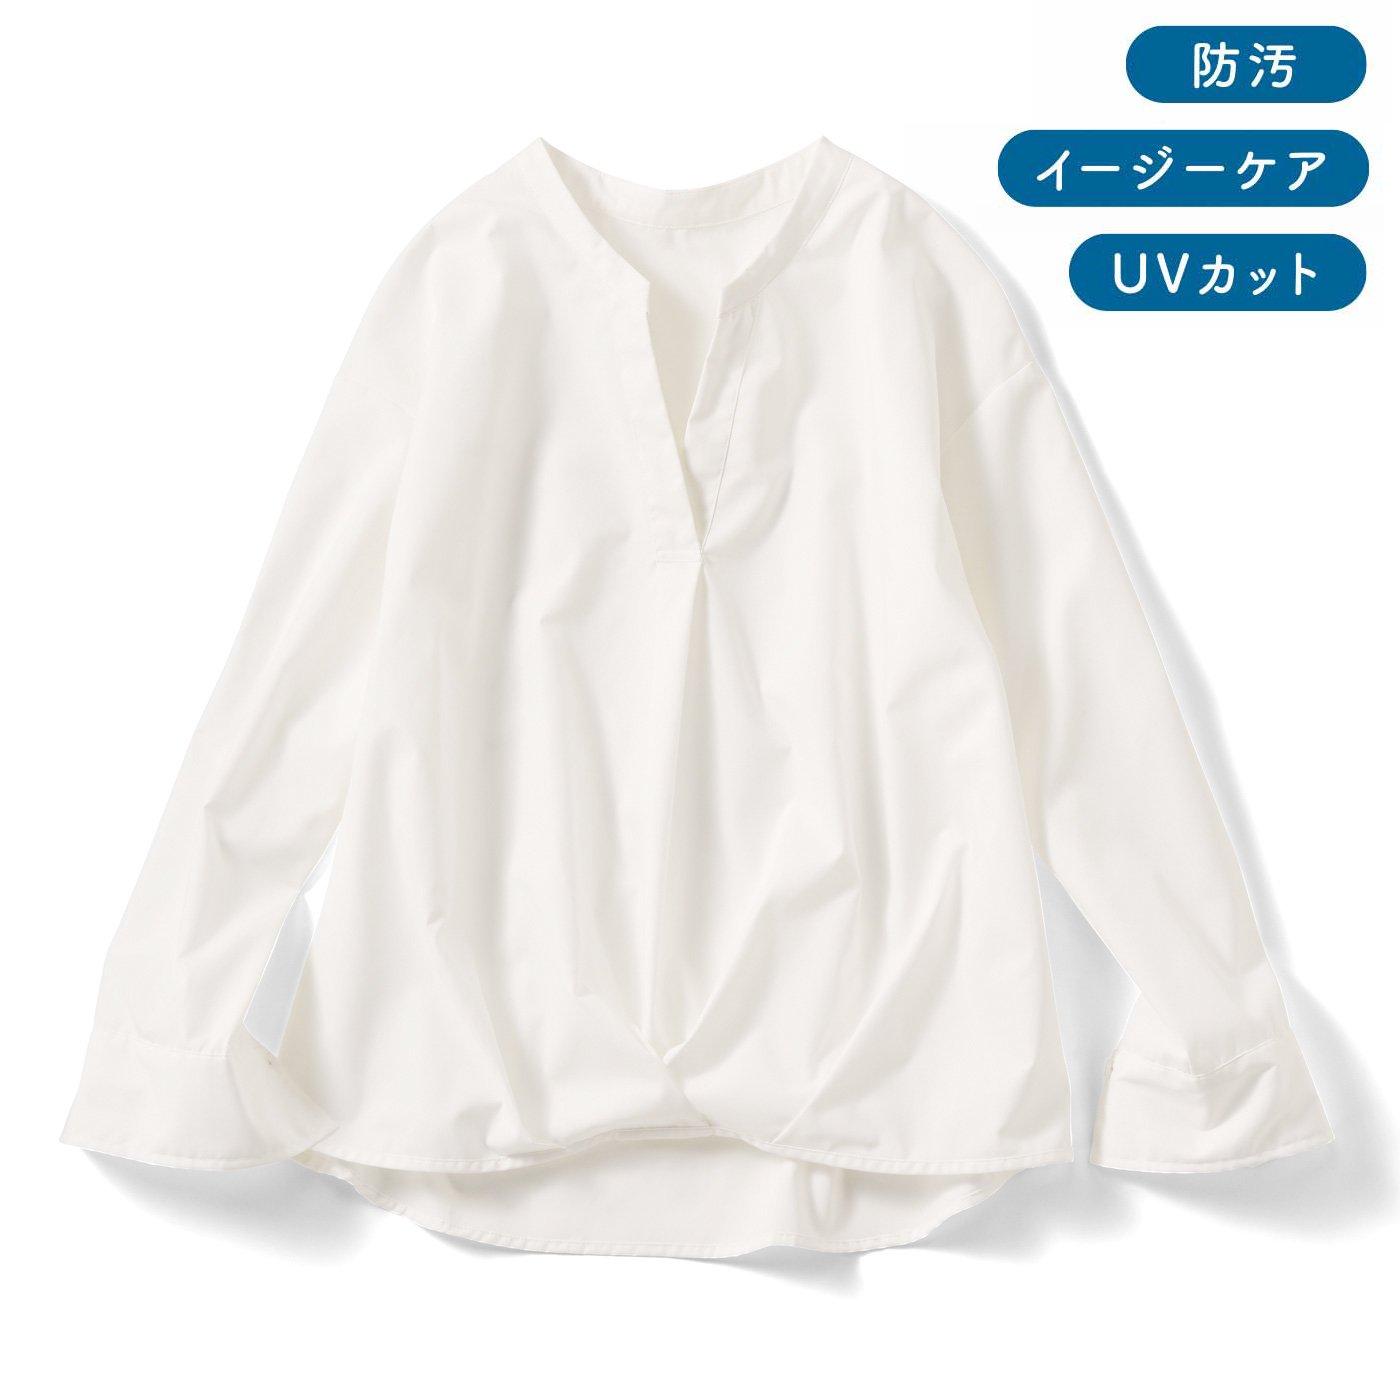 IEDIT[イディット] UVカット&防汚加工!クレバー素材のシャツプルオーバーの会